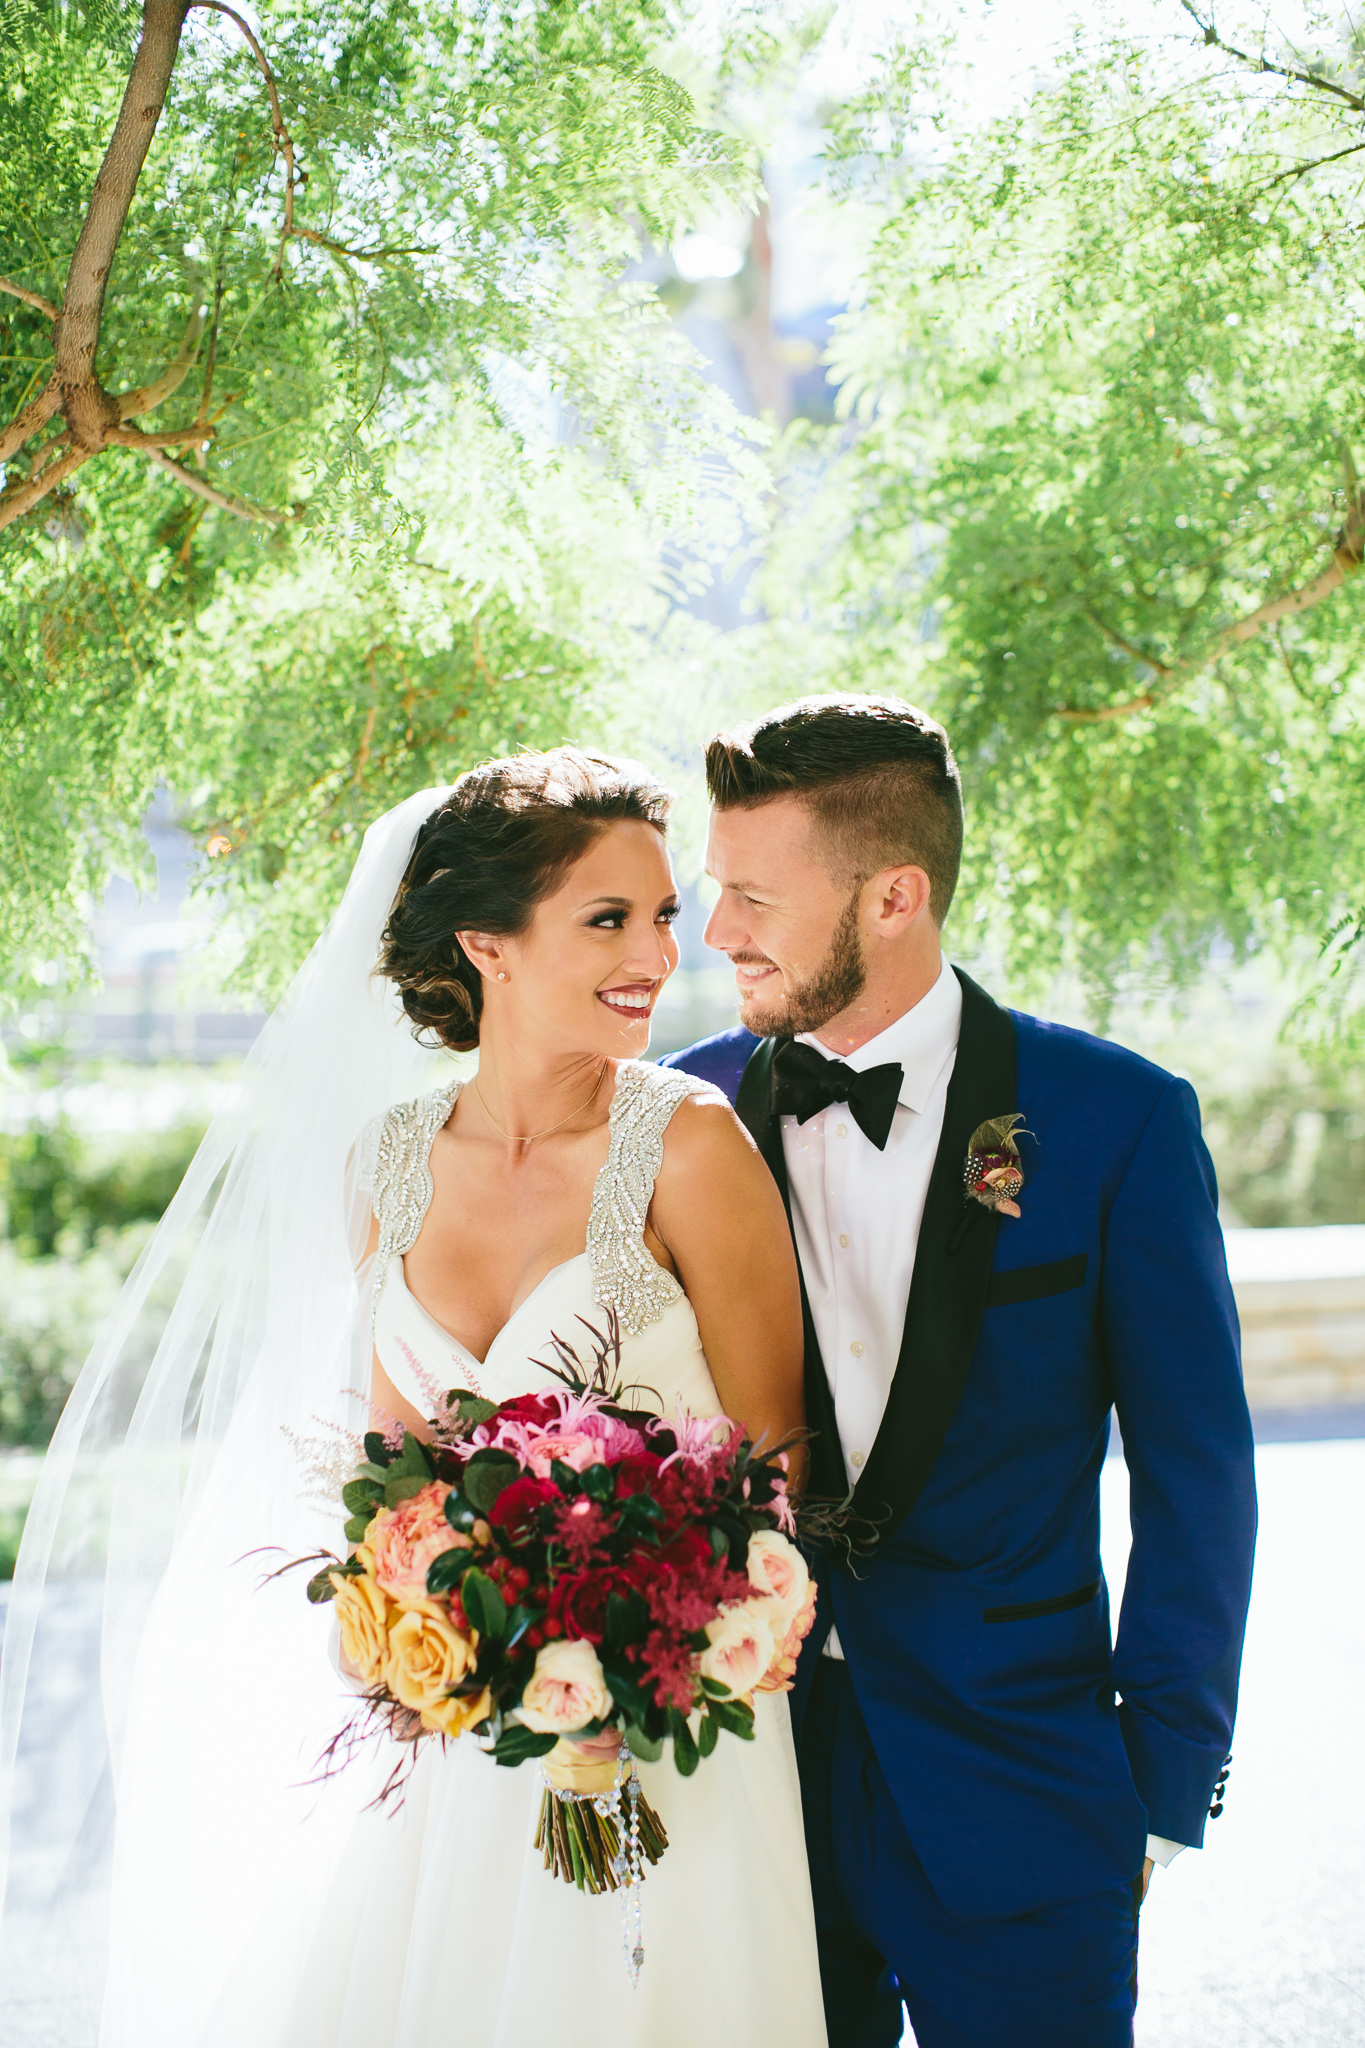 Brianna+Jeff-WEDDING_KellyBoitanoPhotography20151219_0059